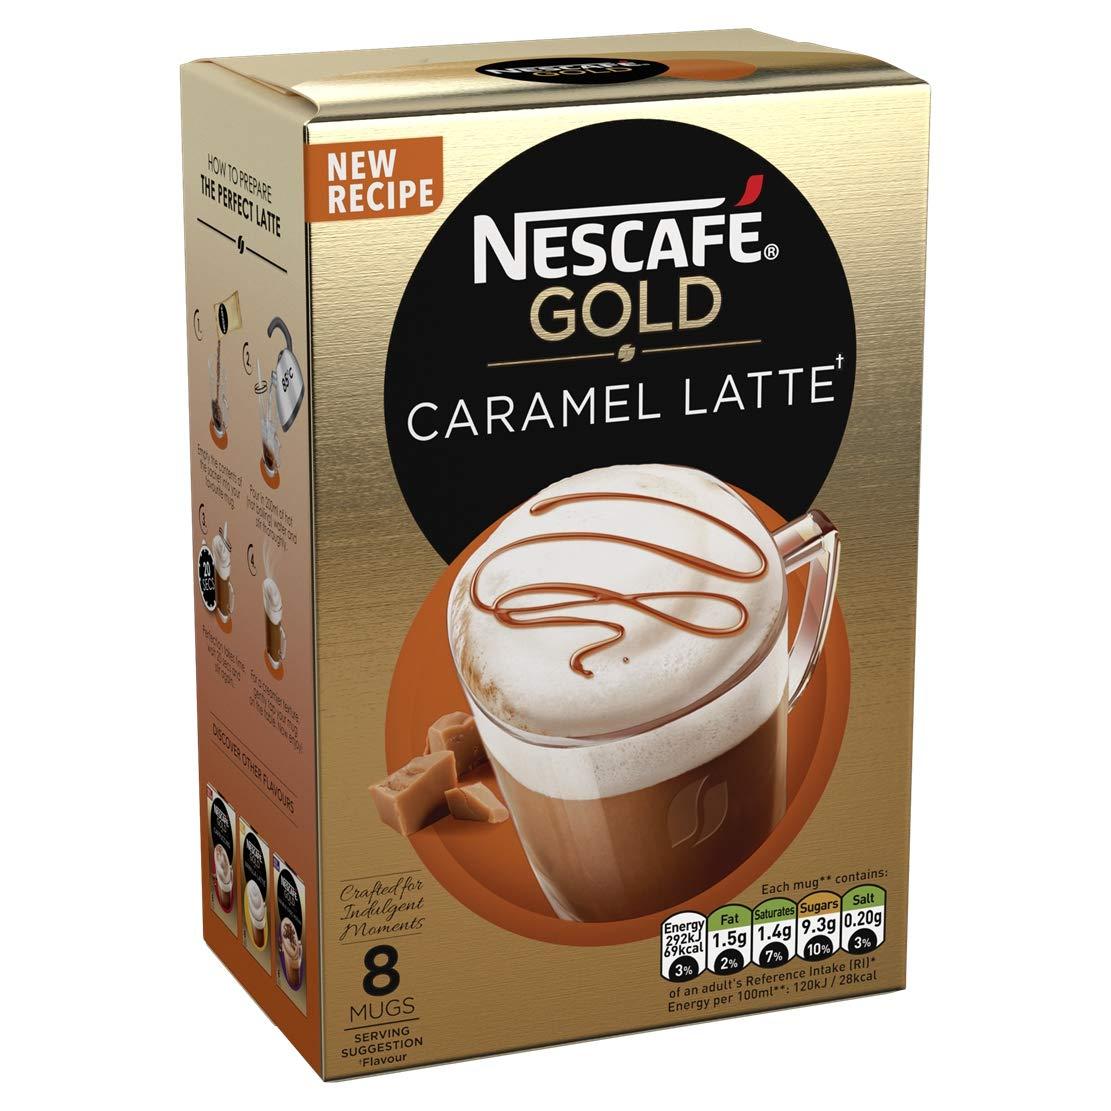 Nescafé Gold Caramel Latte Coffee 8 Sachets Pack Of 6 Total 48 Sachets